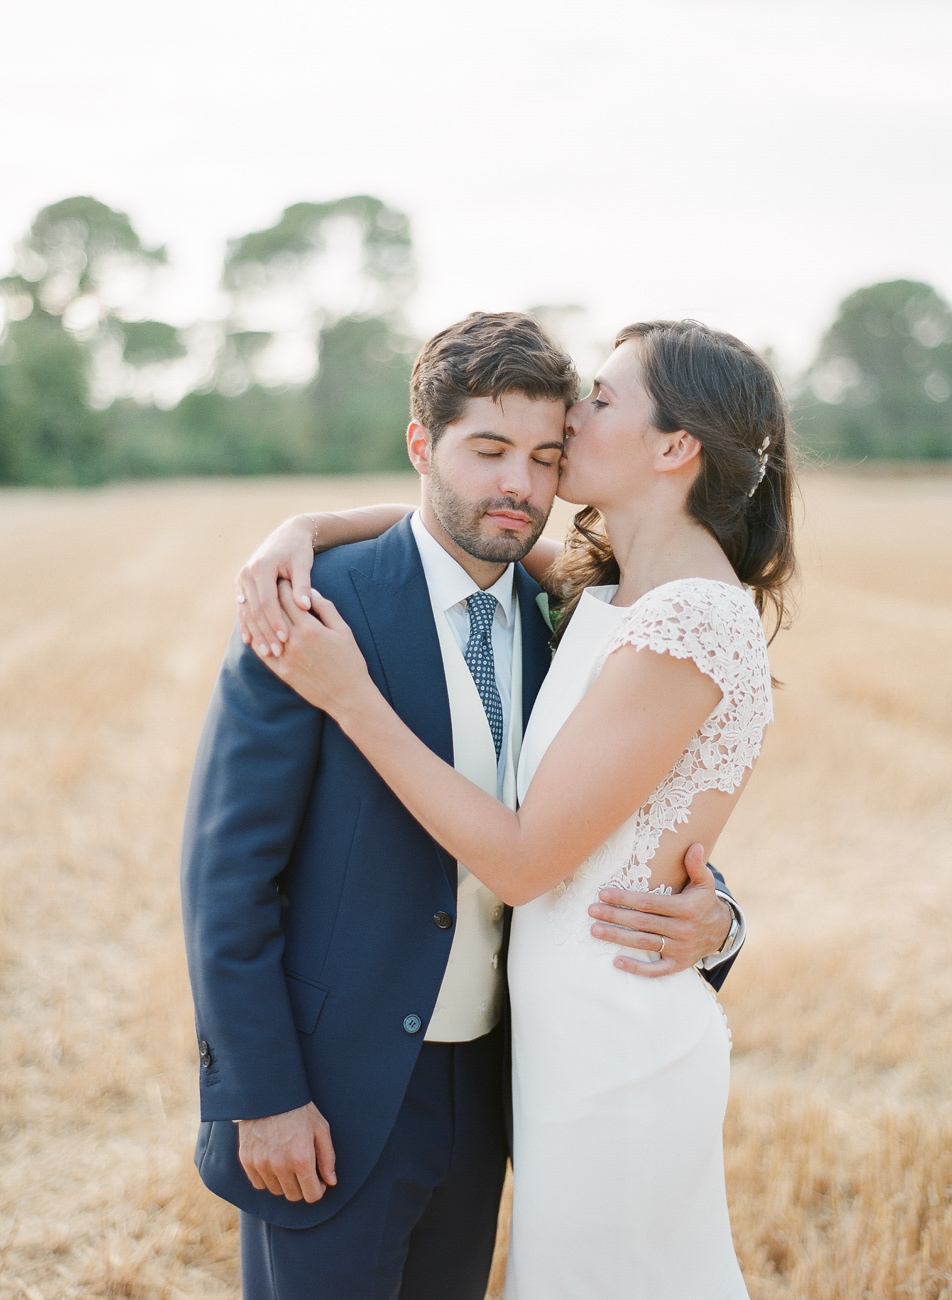 chateau-valmousse-photographe-mariage-alain-m-27.jpg